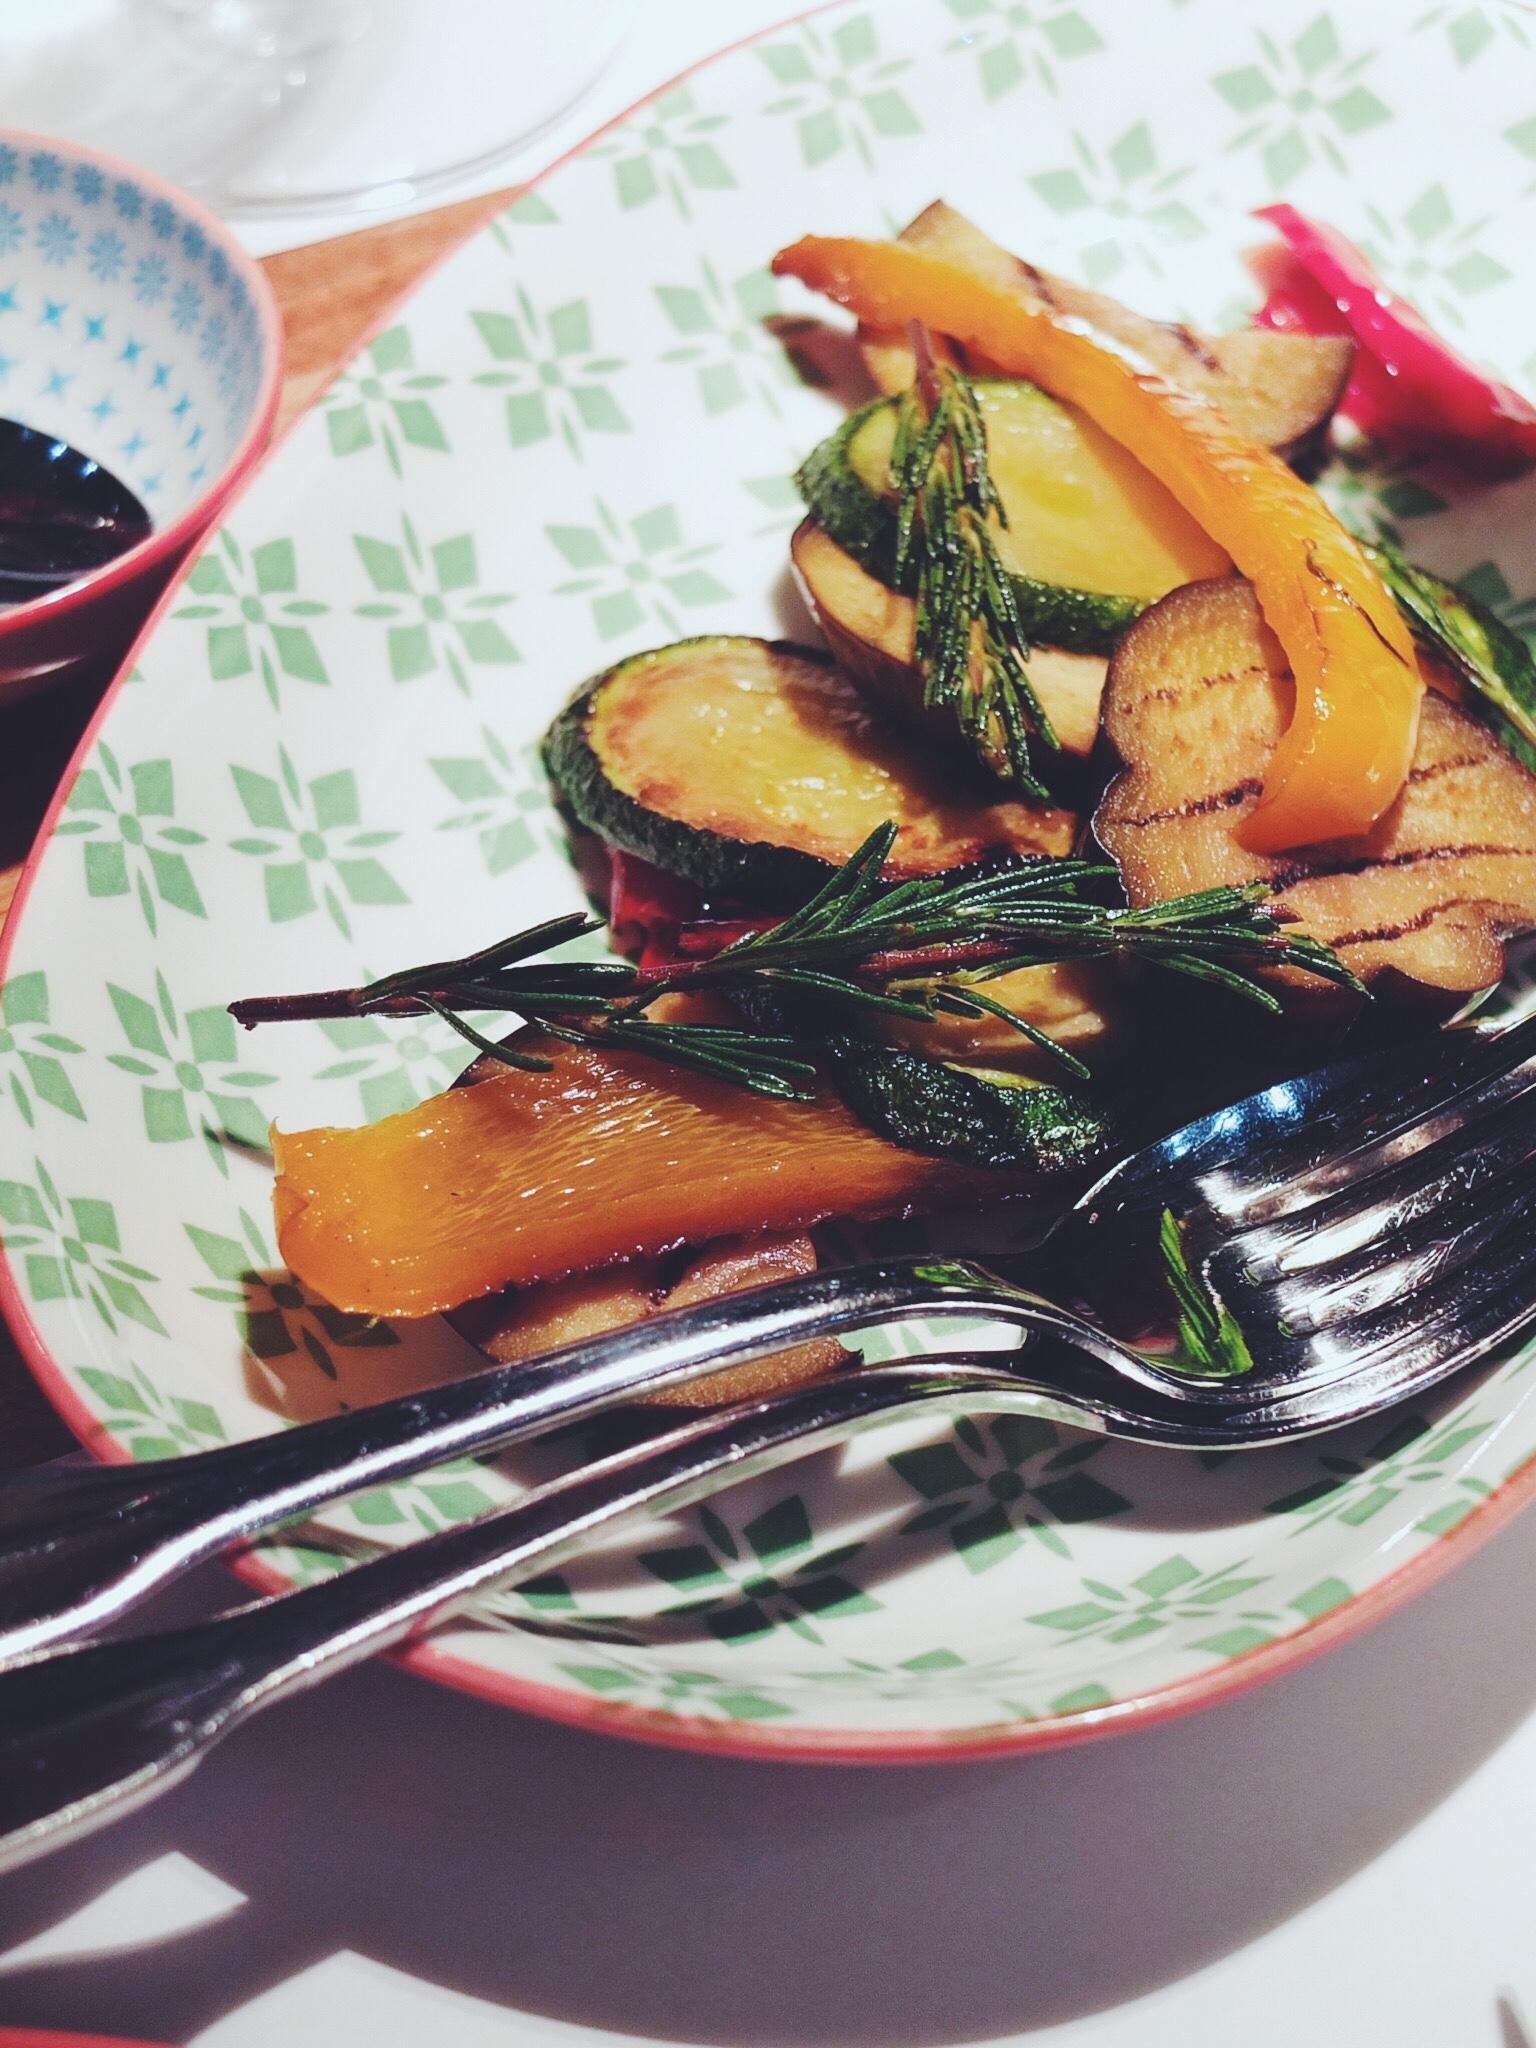 Anipasto veggies